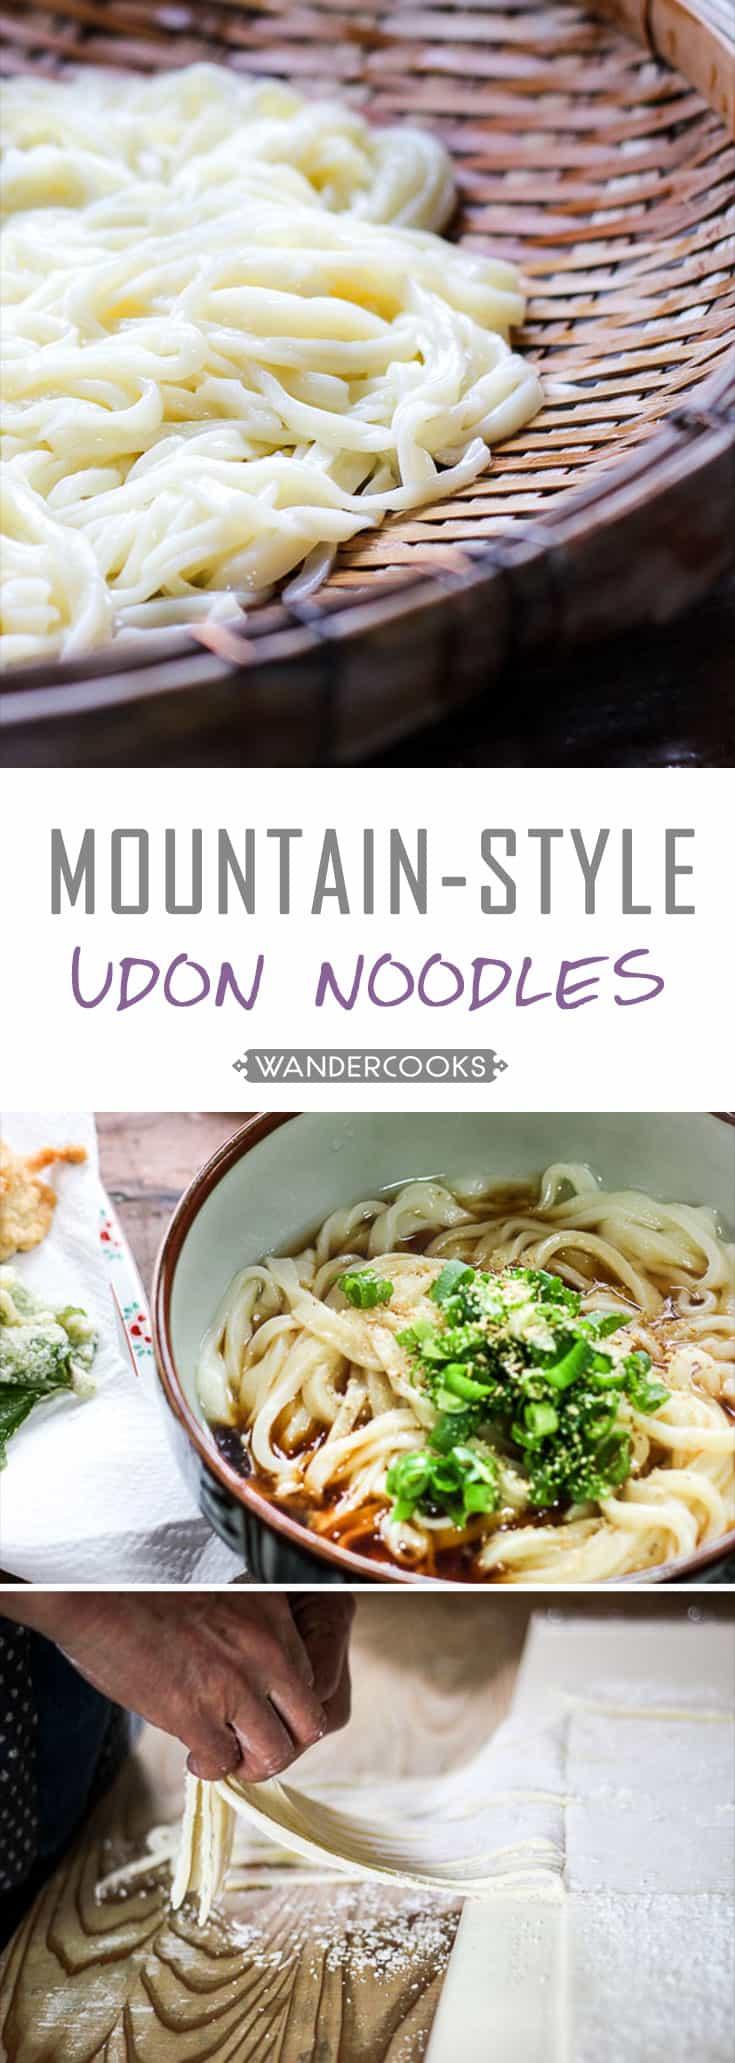 Shikoku Mountain-Style Udon Noodles